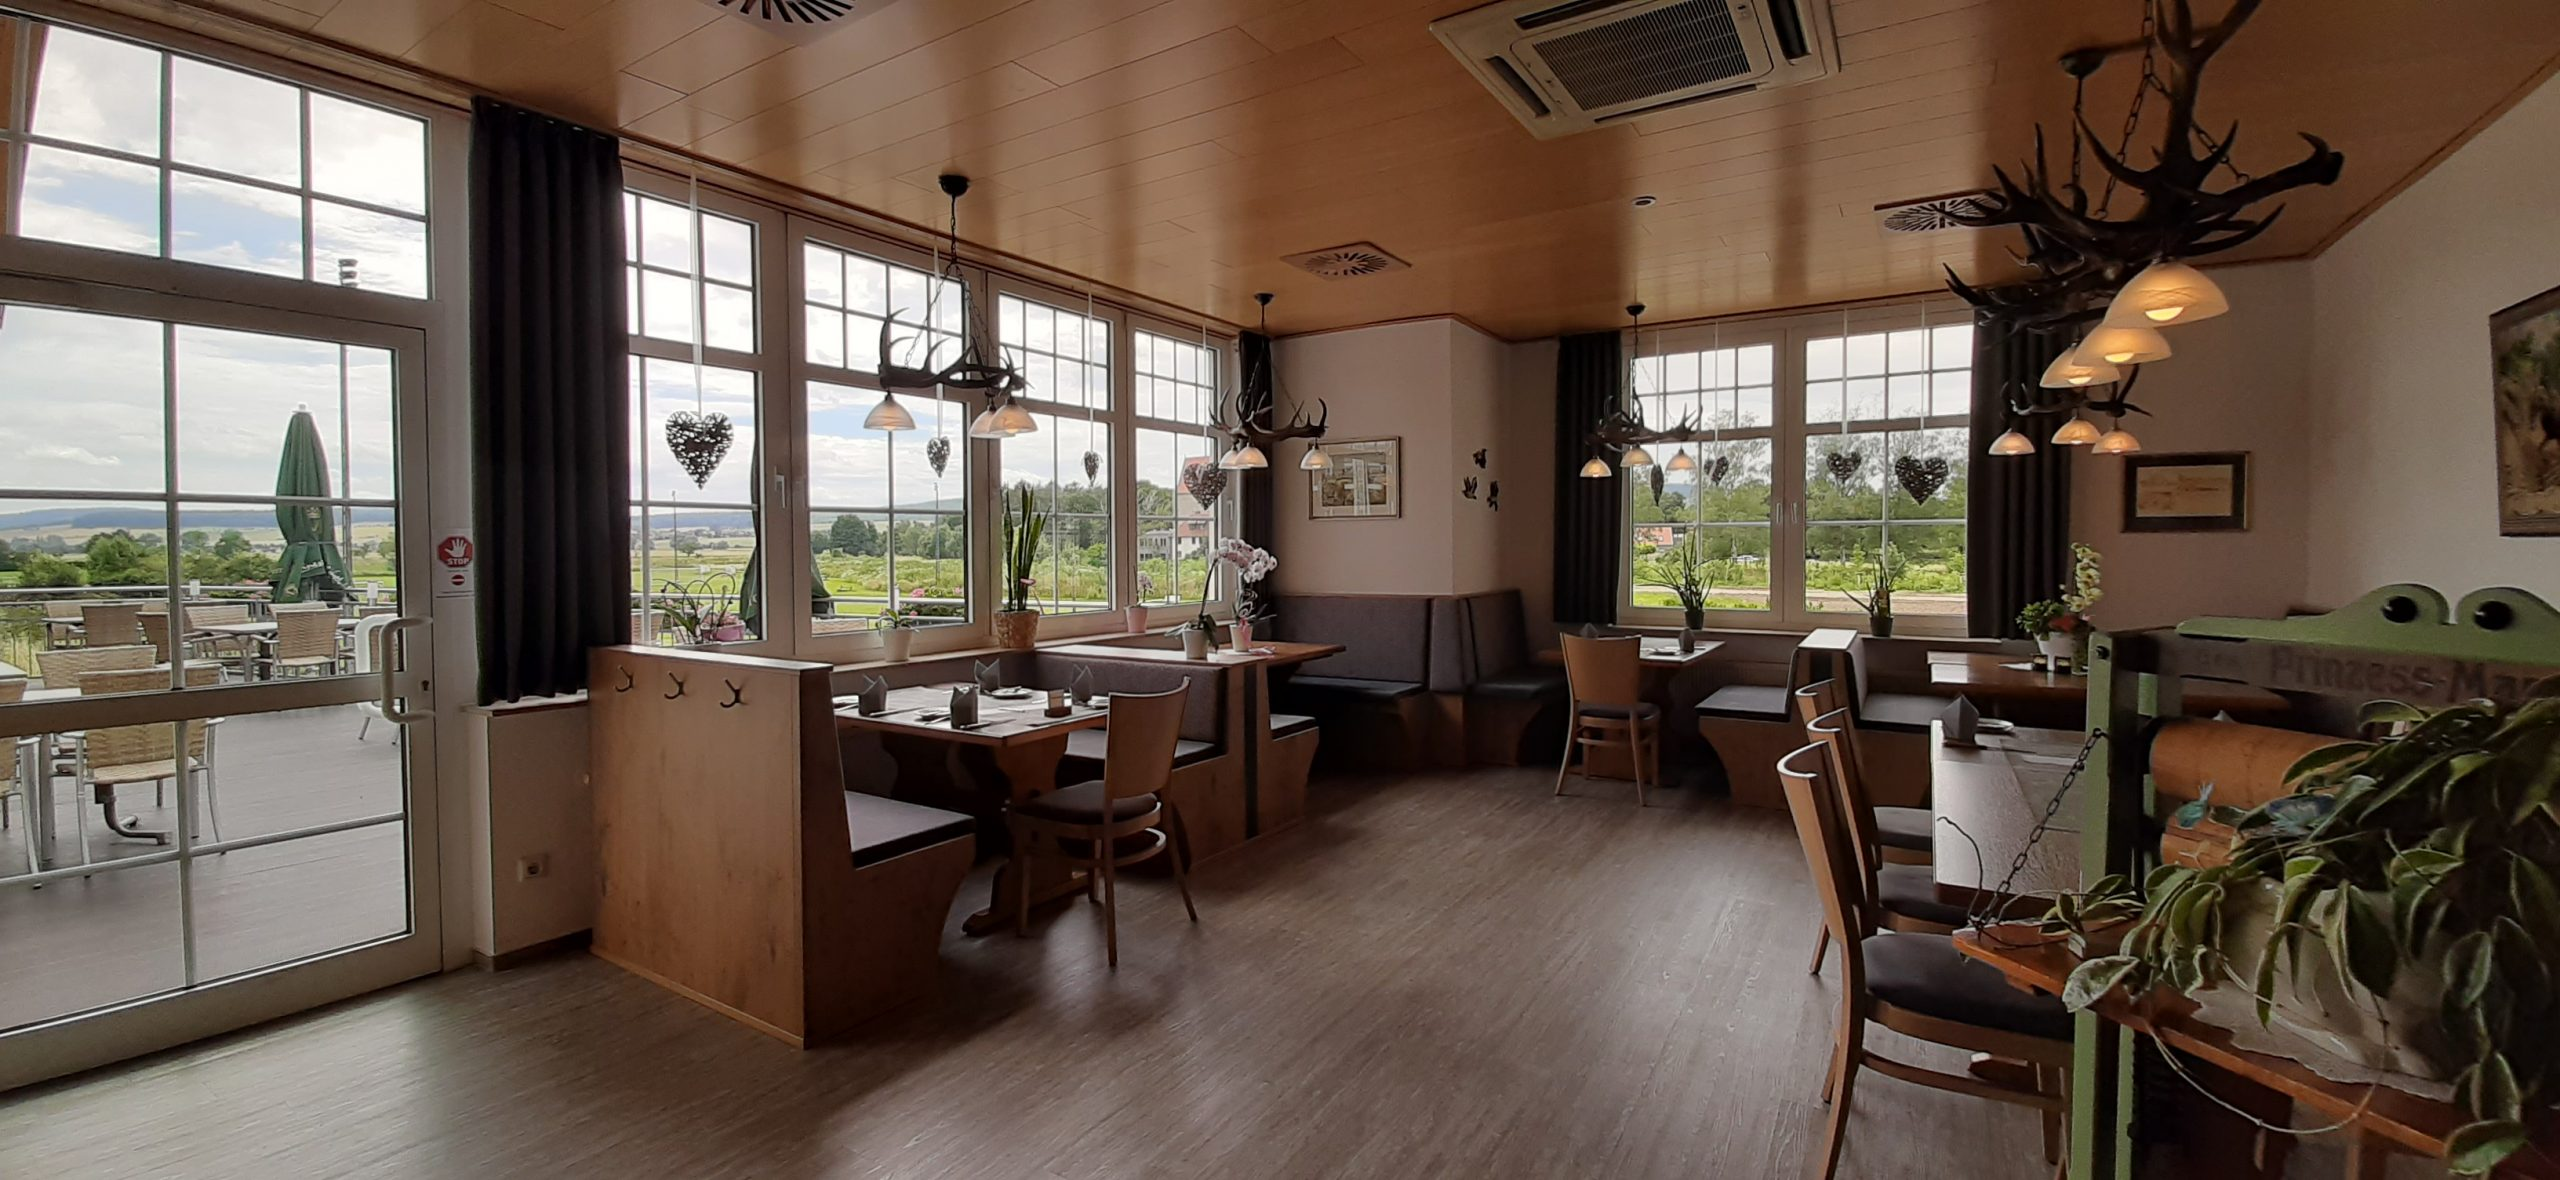 Restaurant mit Blick ins Gruene